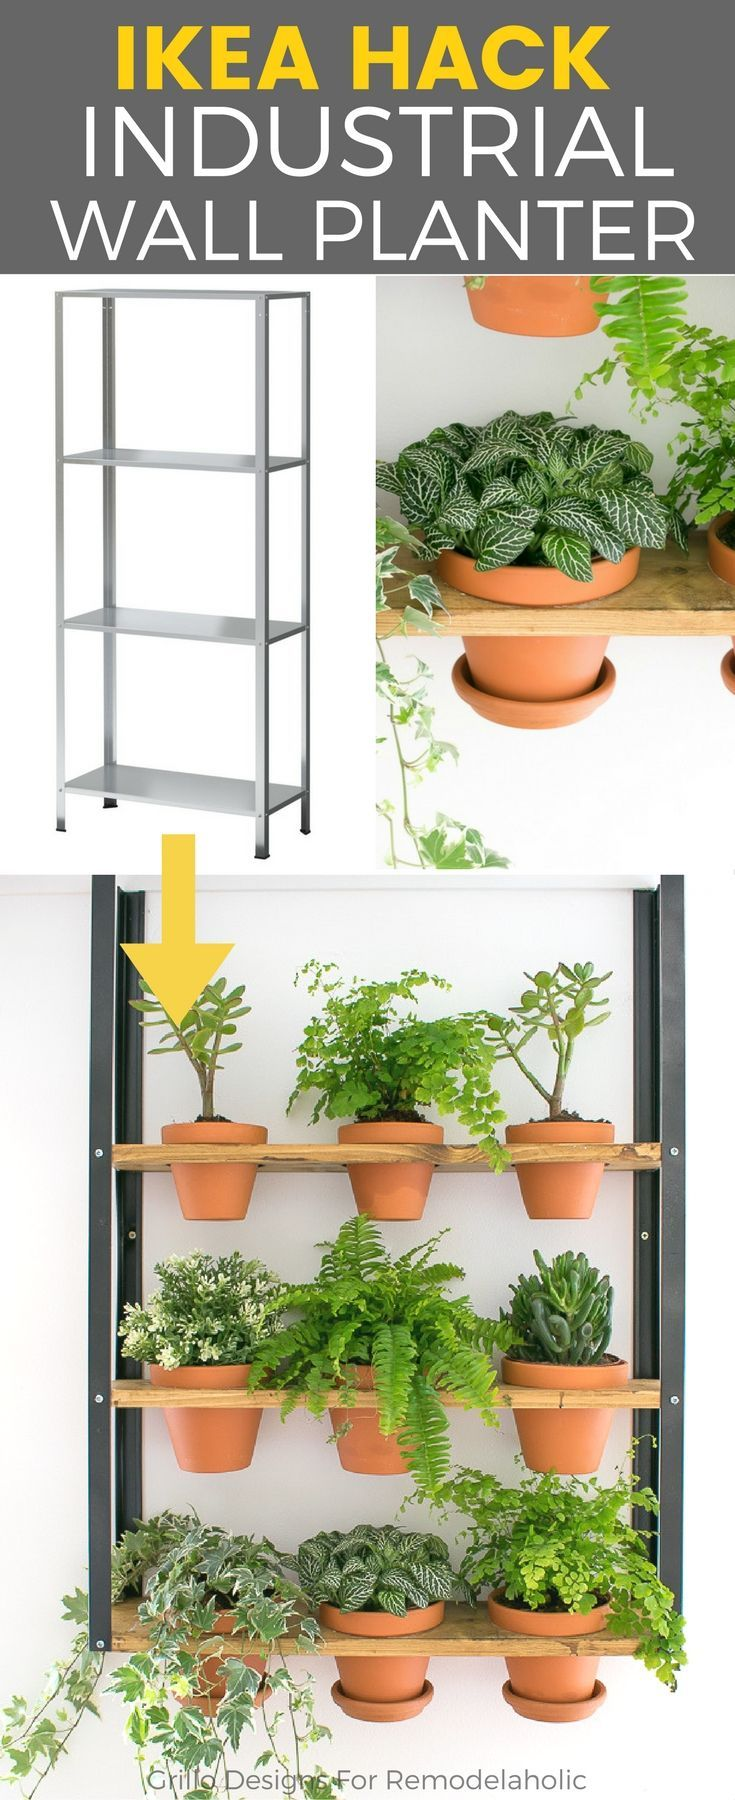 HYLLIS IKEA Hack: Industrial Wall Planter | furniture ...